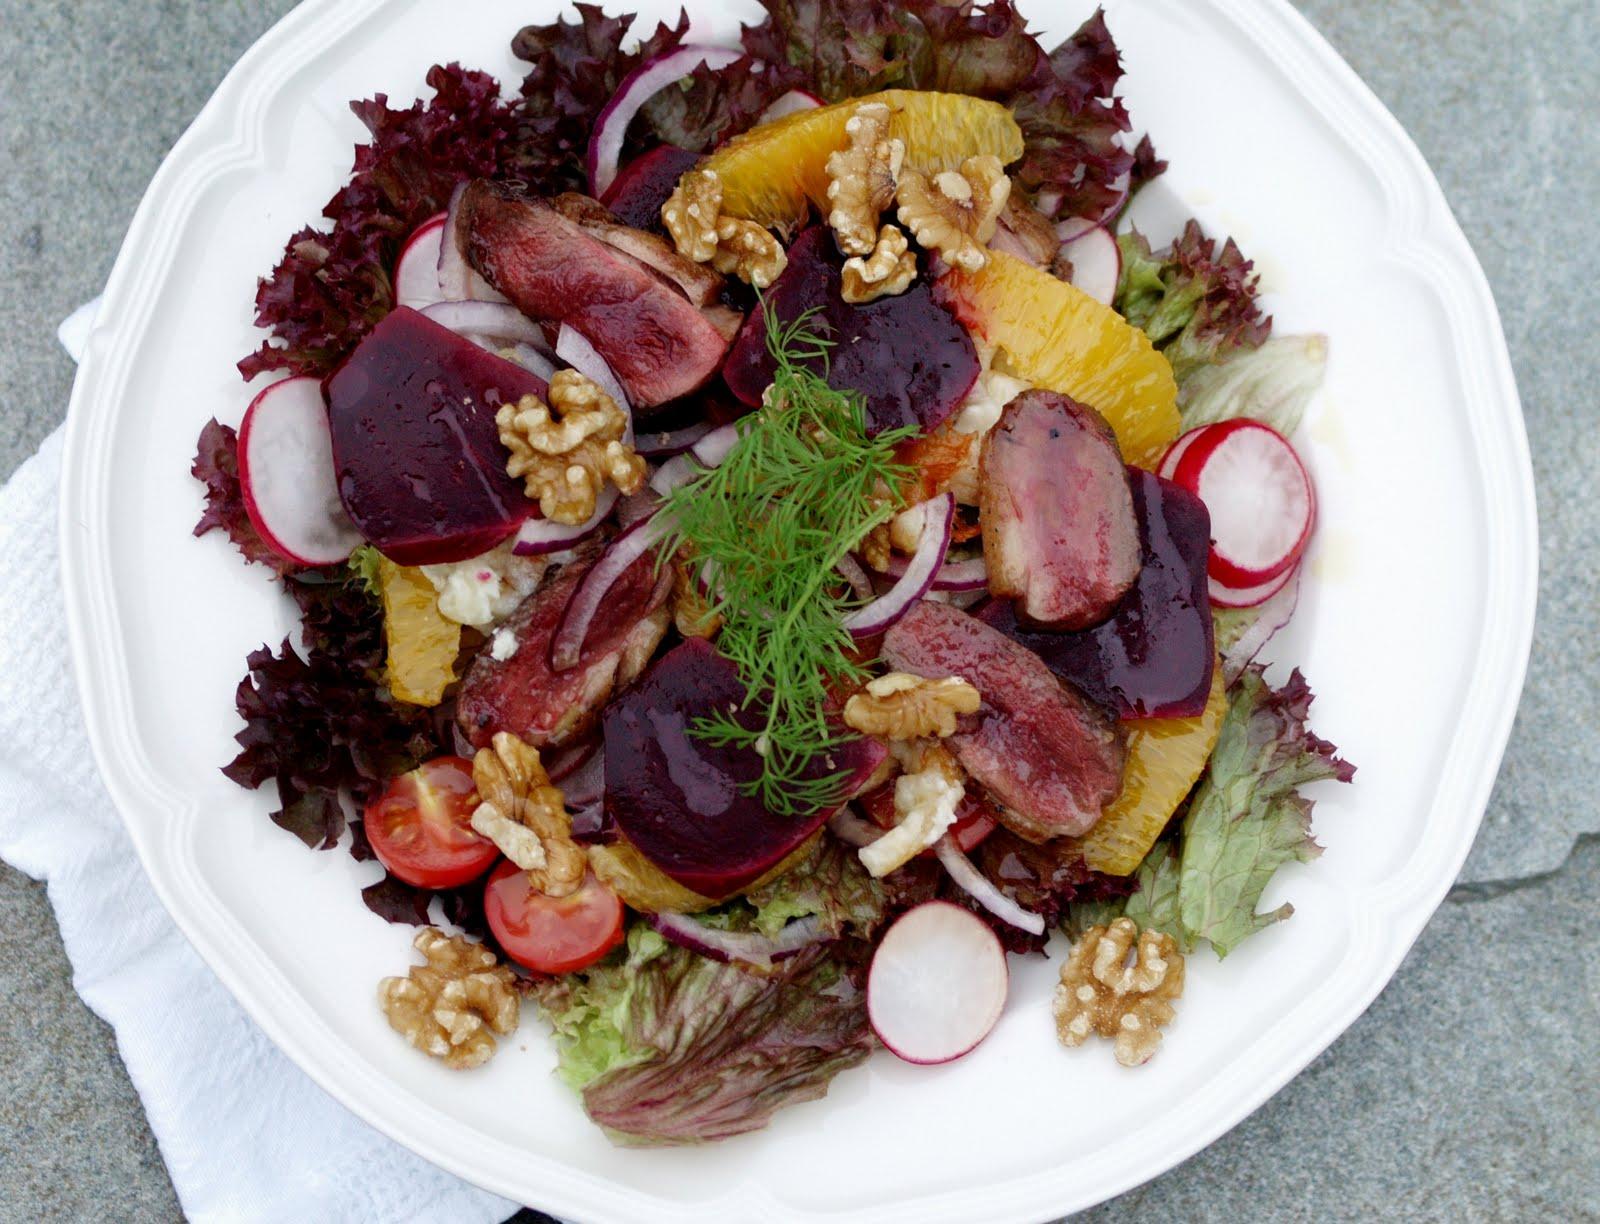 Salat andebryst oppskrift